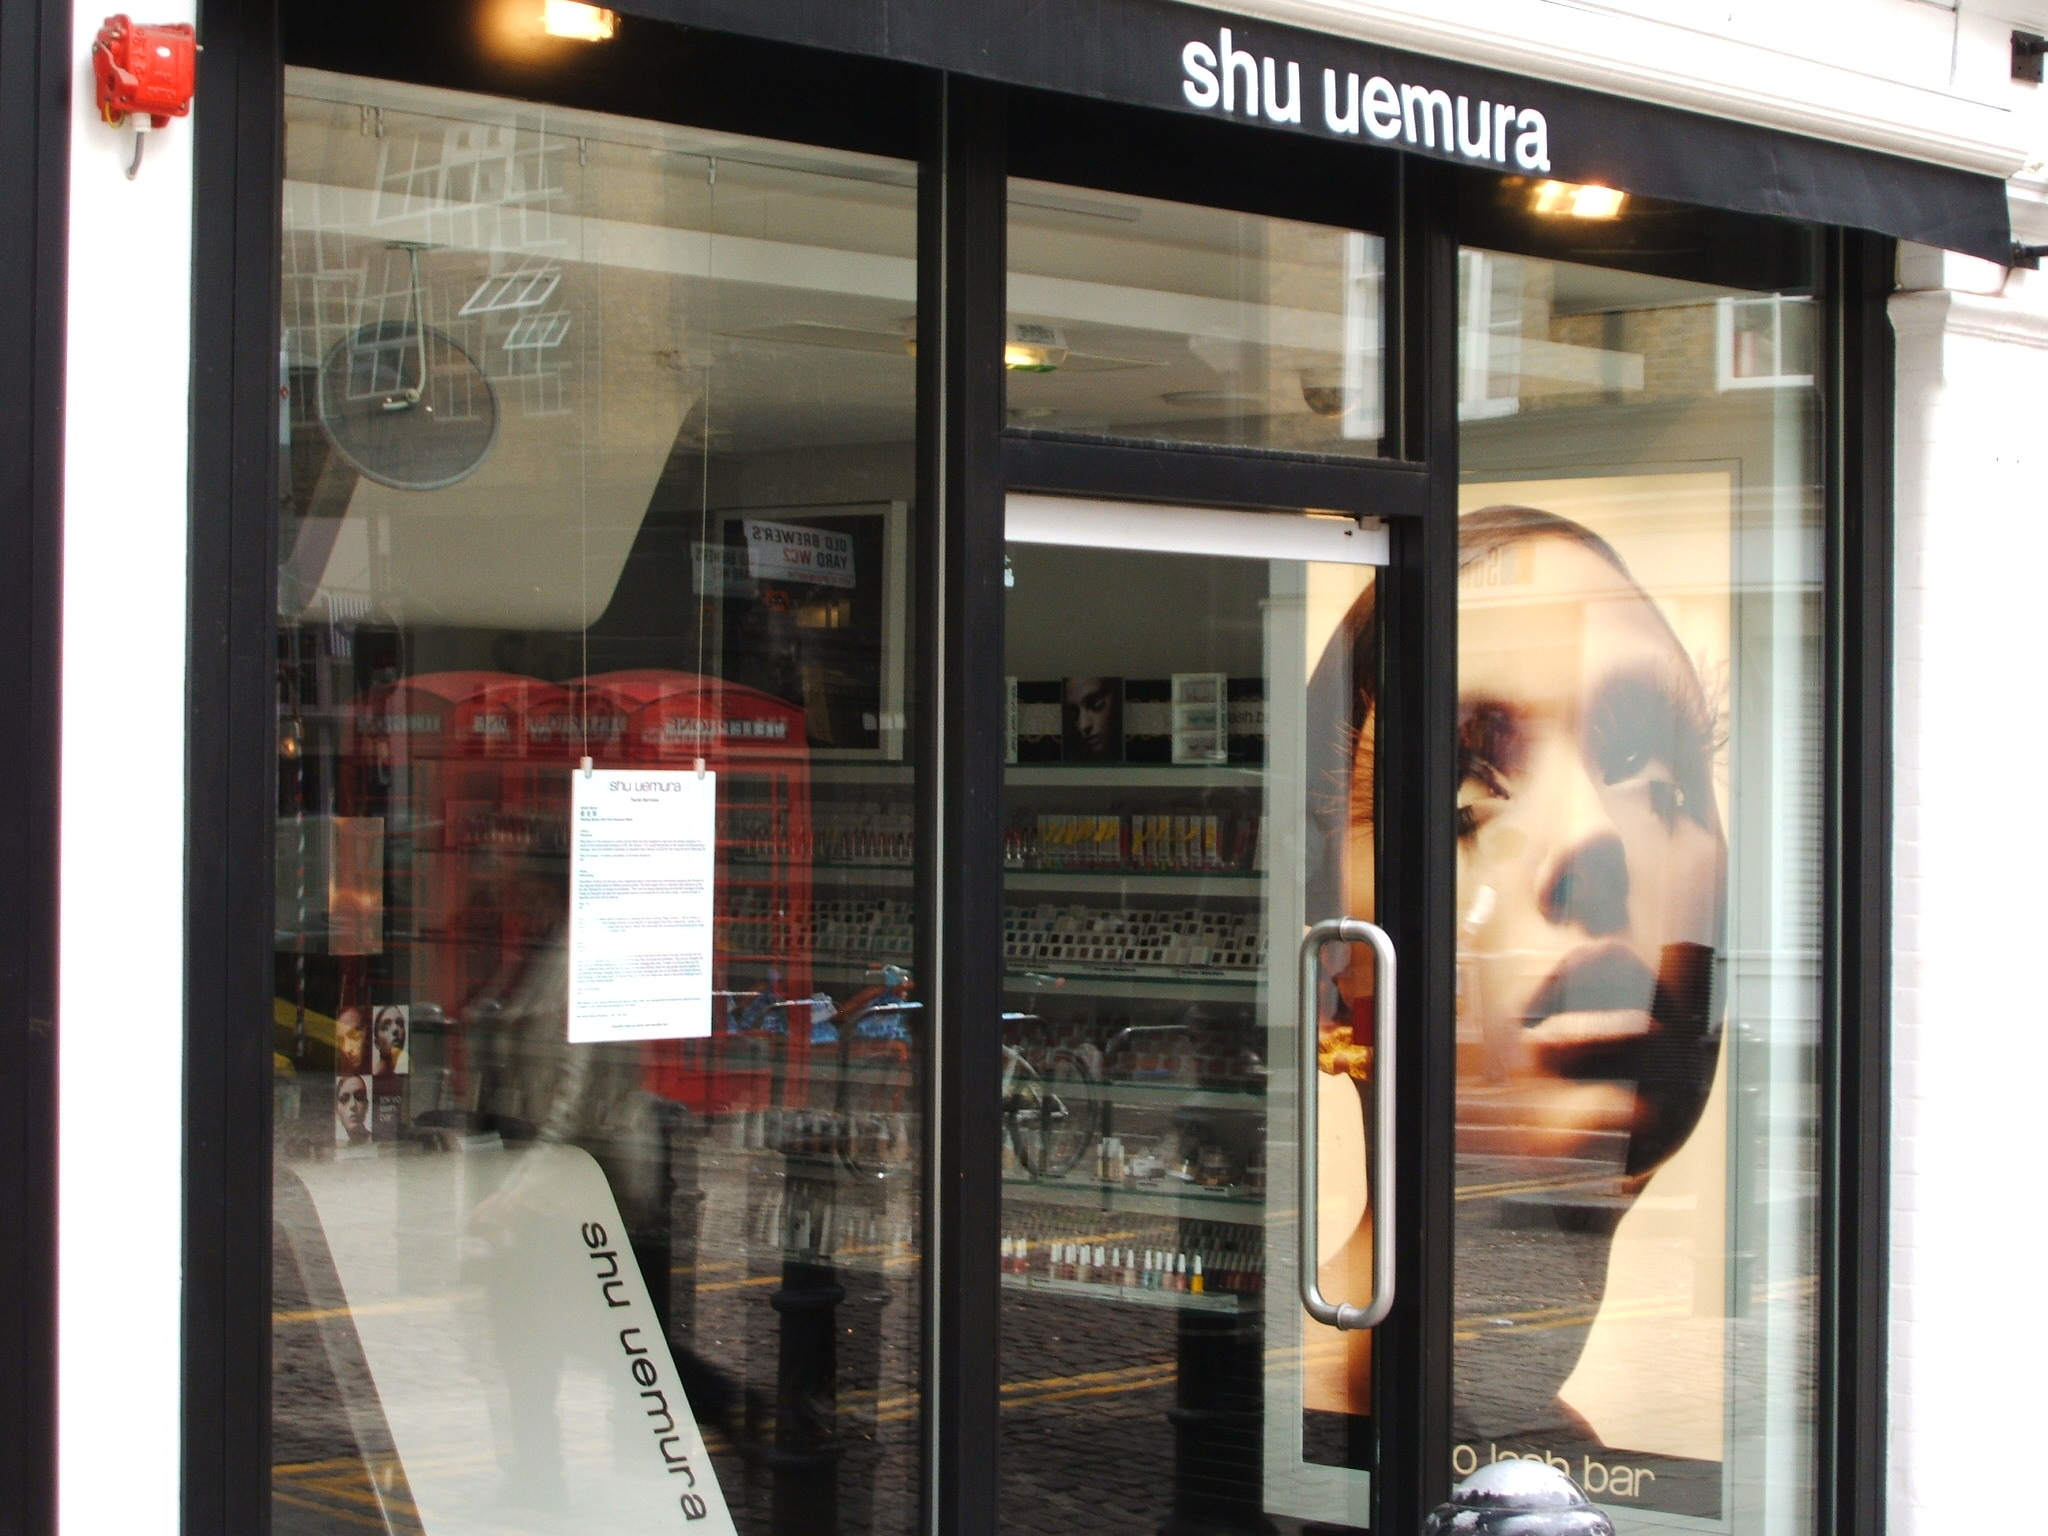 Shu Uemura London